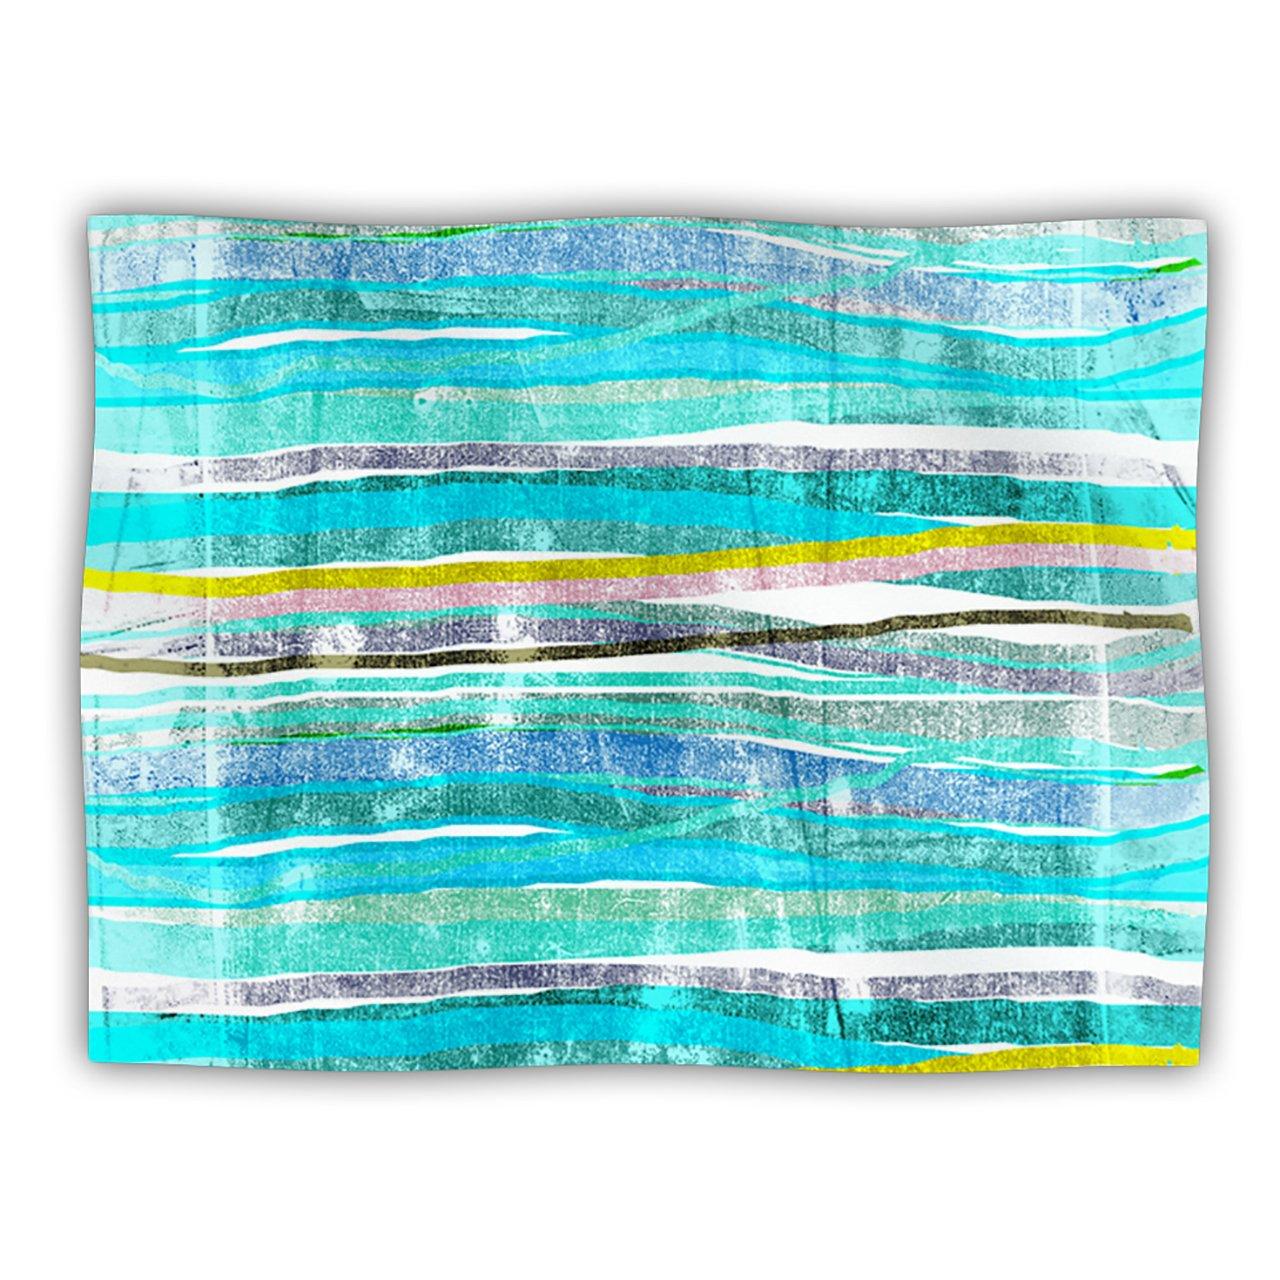 Kess InHouse Frederic Levy-Hadida Fancy Stripes Aqua Pet Blanket, 40 by 30-Inch